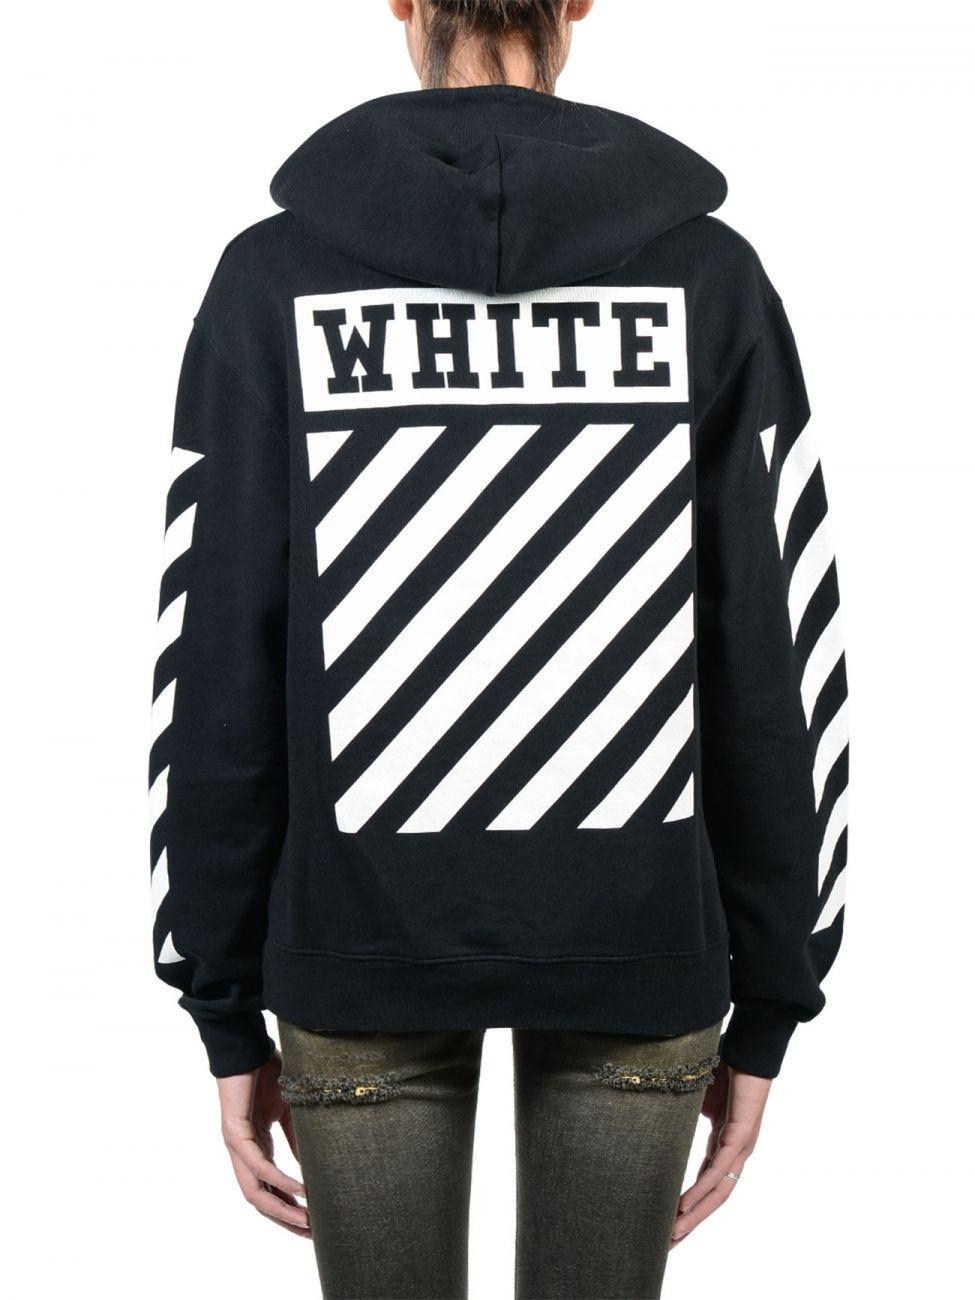 a484ebec0 Off-white c/o virgil abloh Caravaggio Black Hoodie in Black | Lyst ...